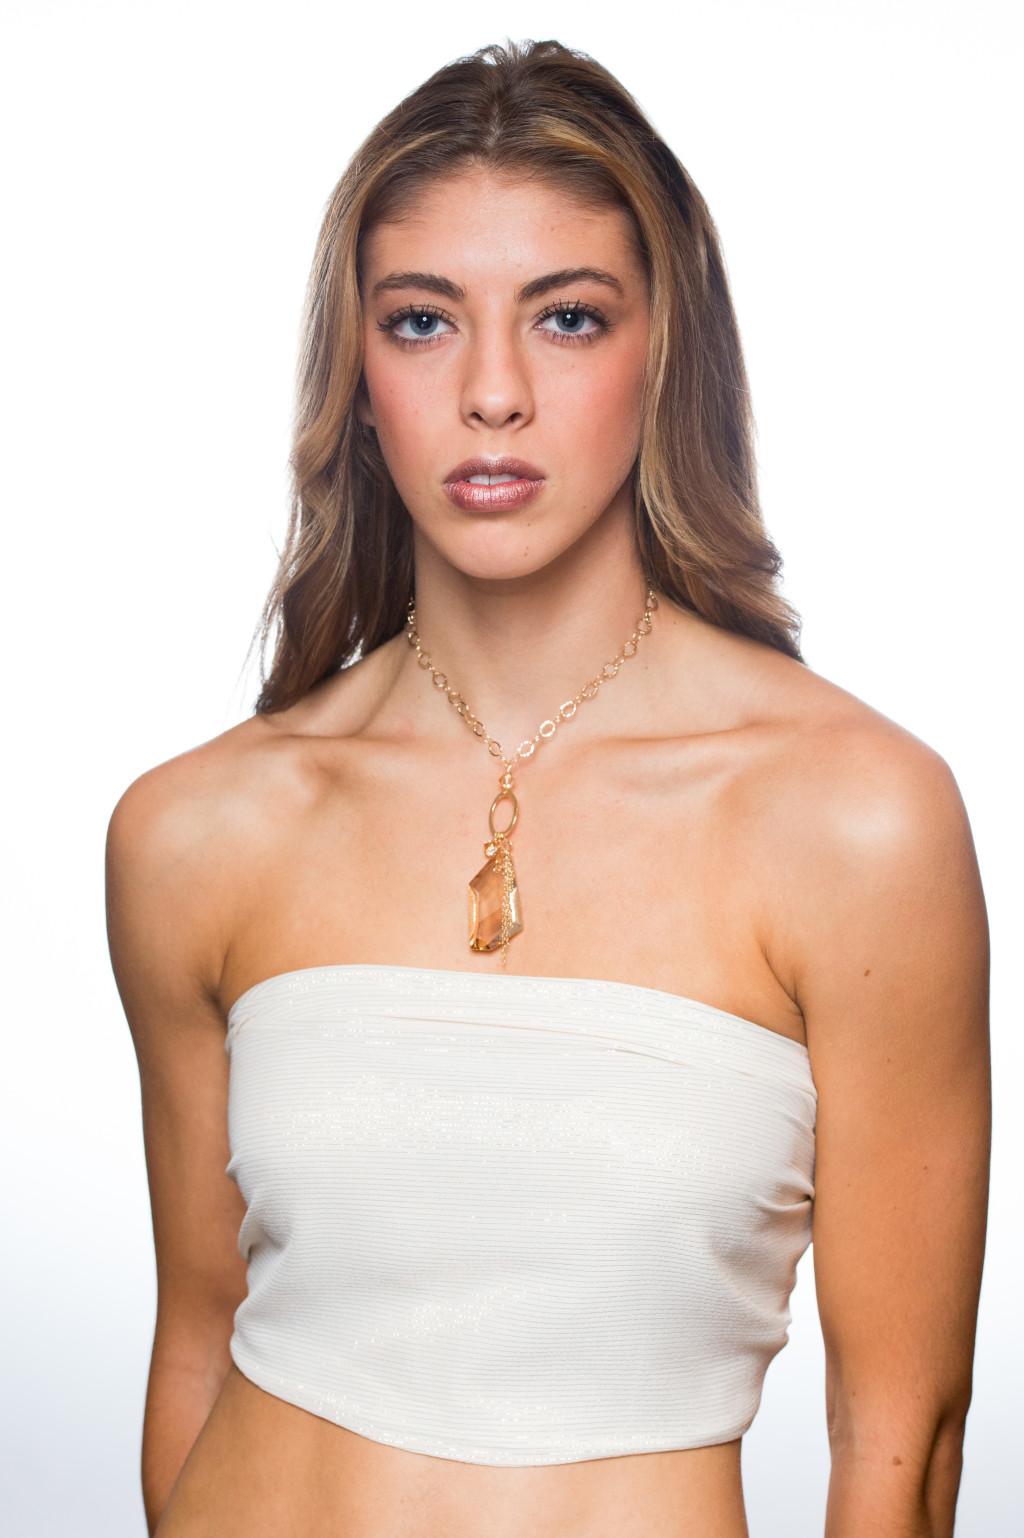 JFG designers, jewellery, vfw